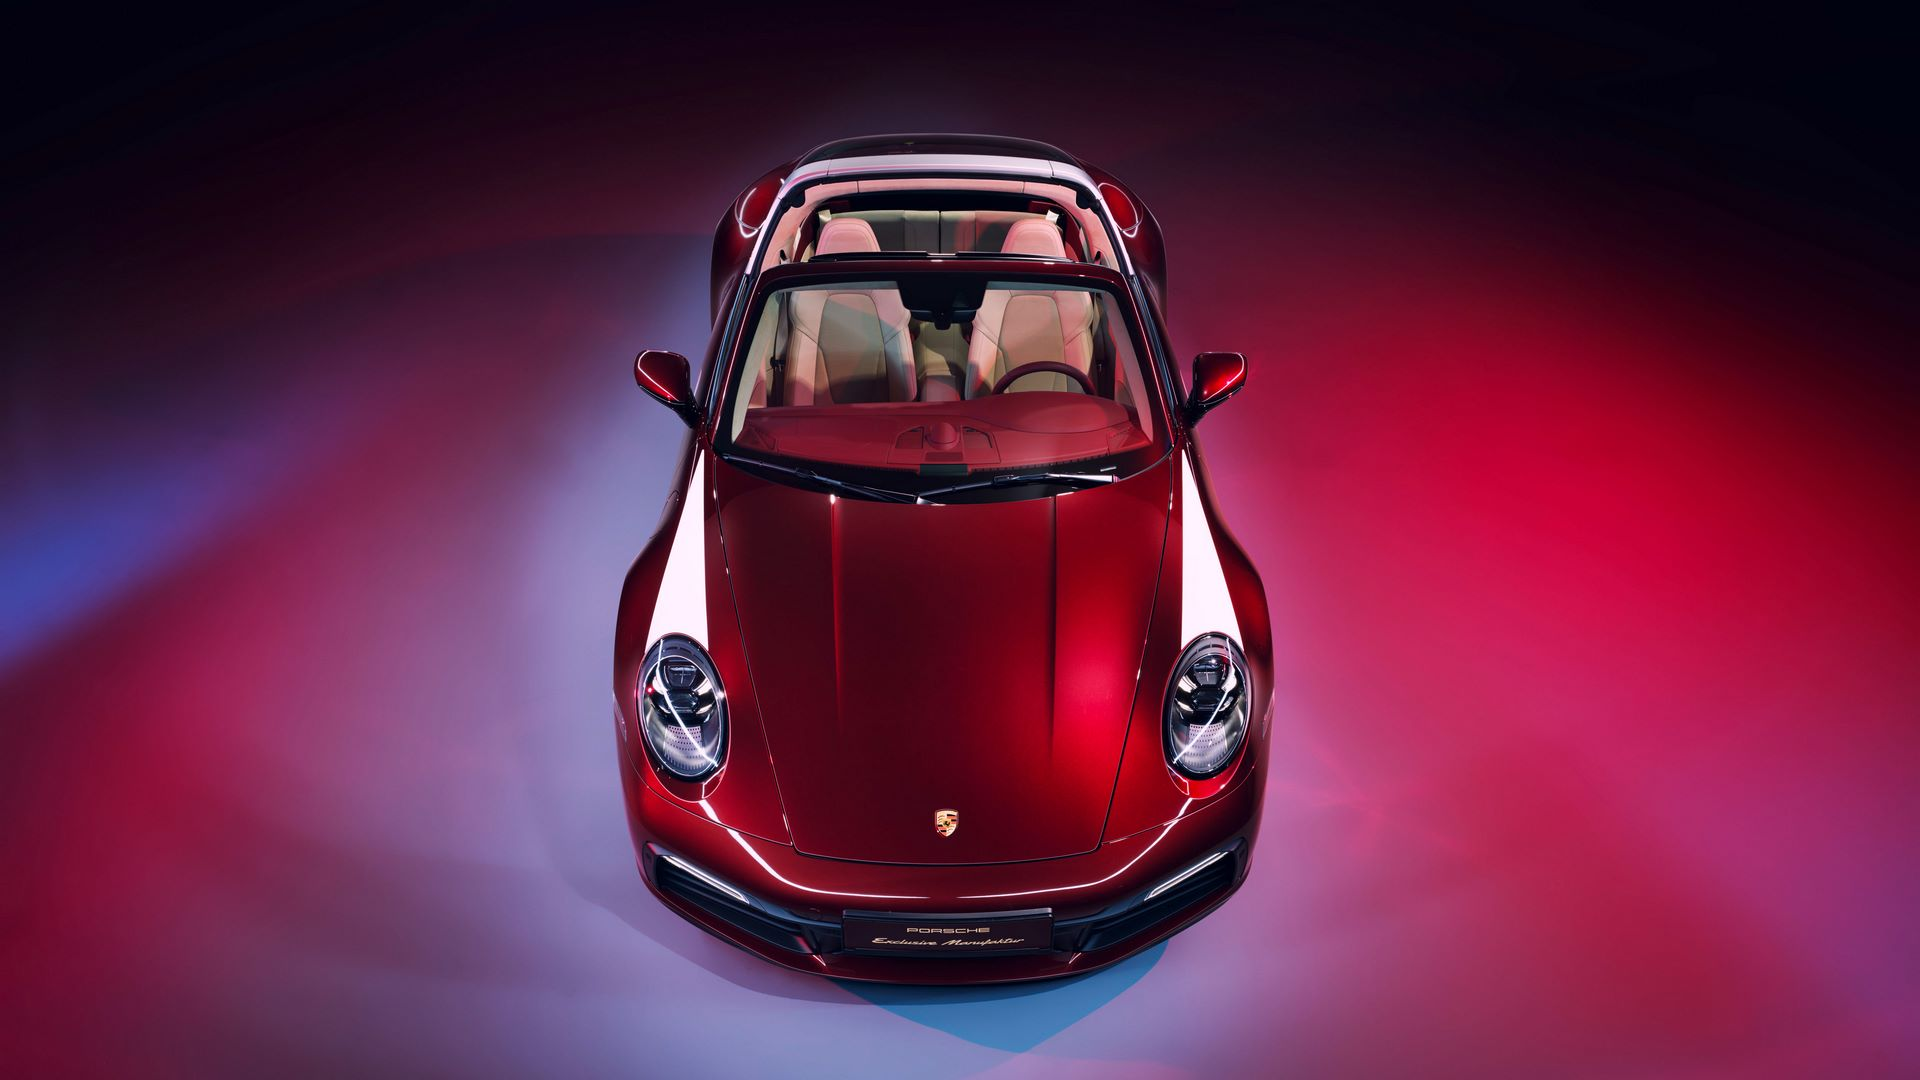 Porsche-911-Targa-4S-Heritage-Design-Edition-19